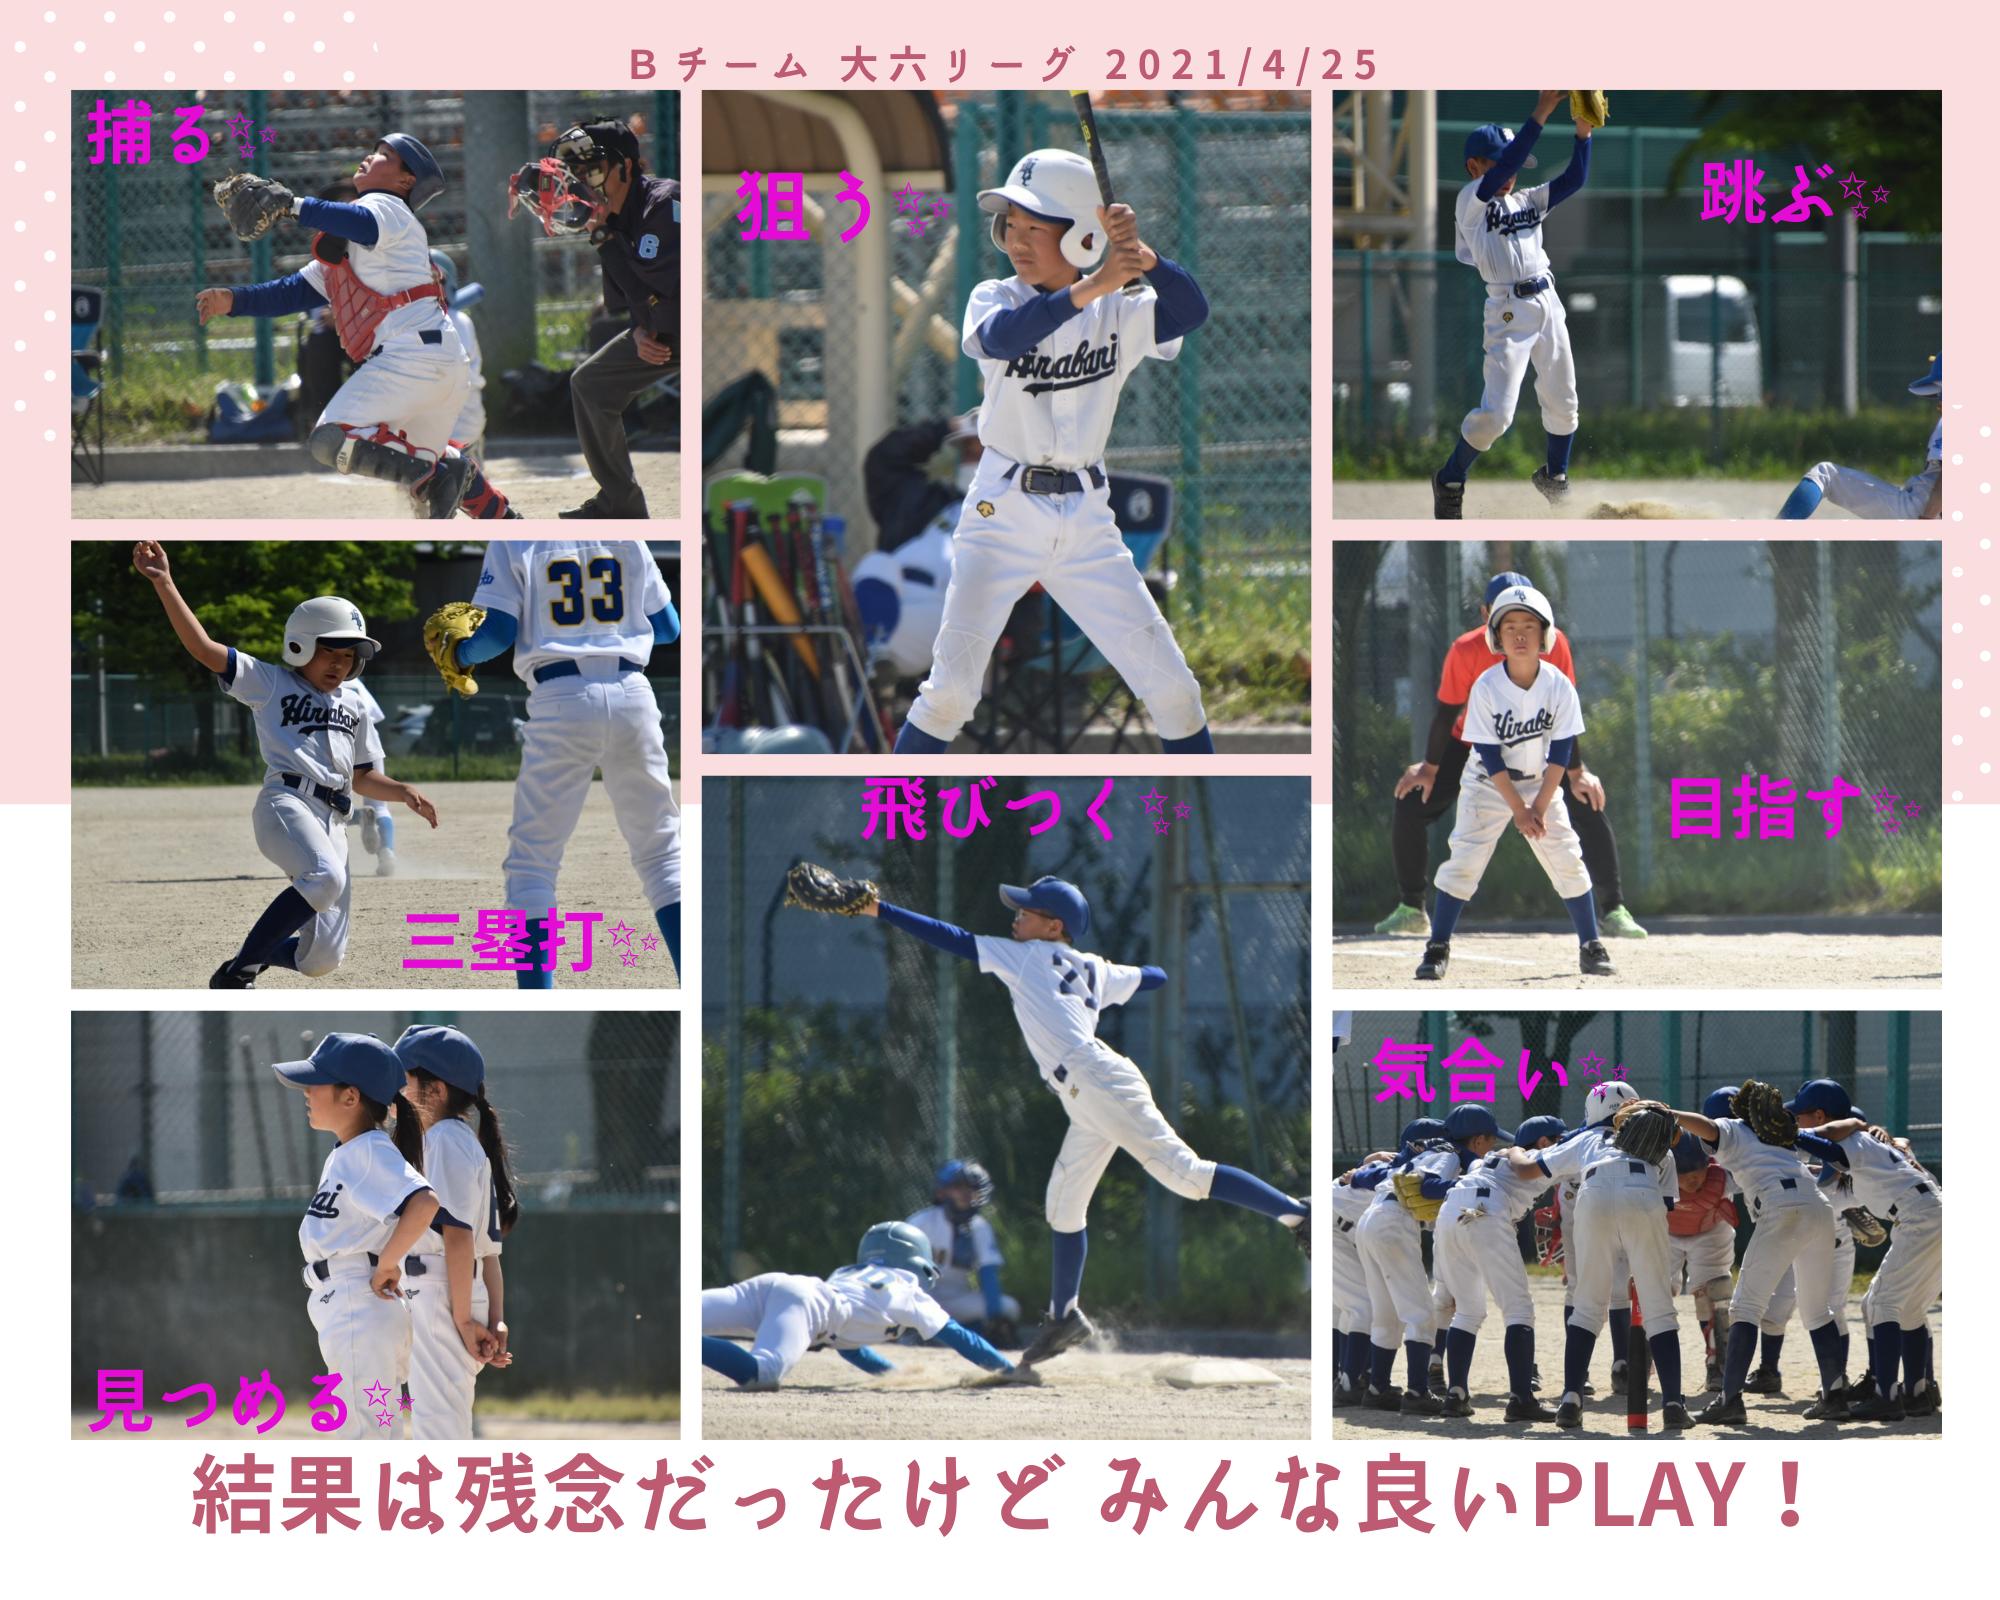 '21/4/25 Bチーム「大六リーグ」